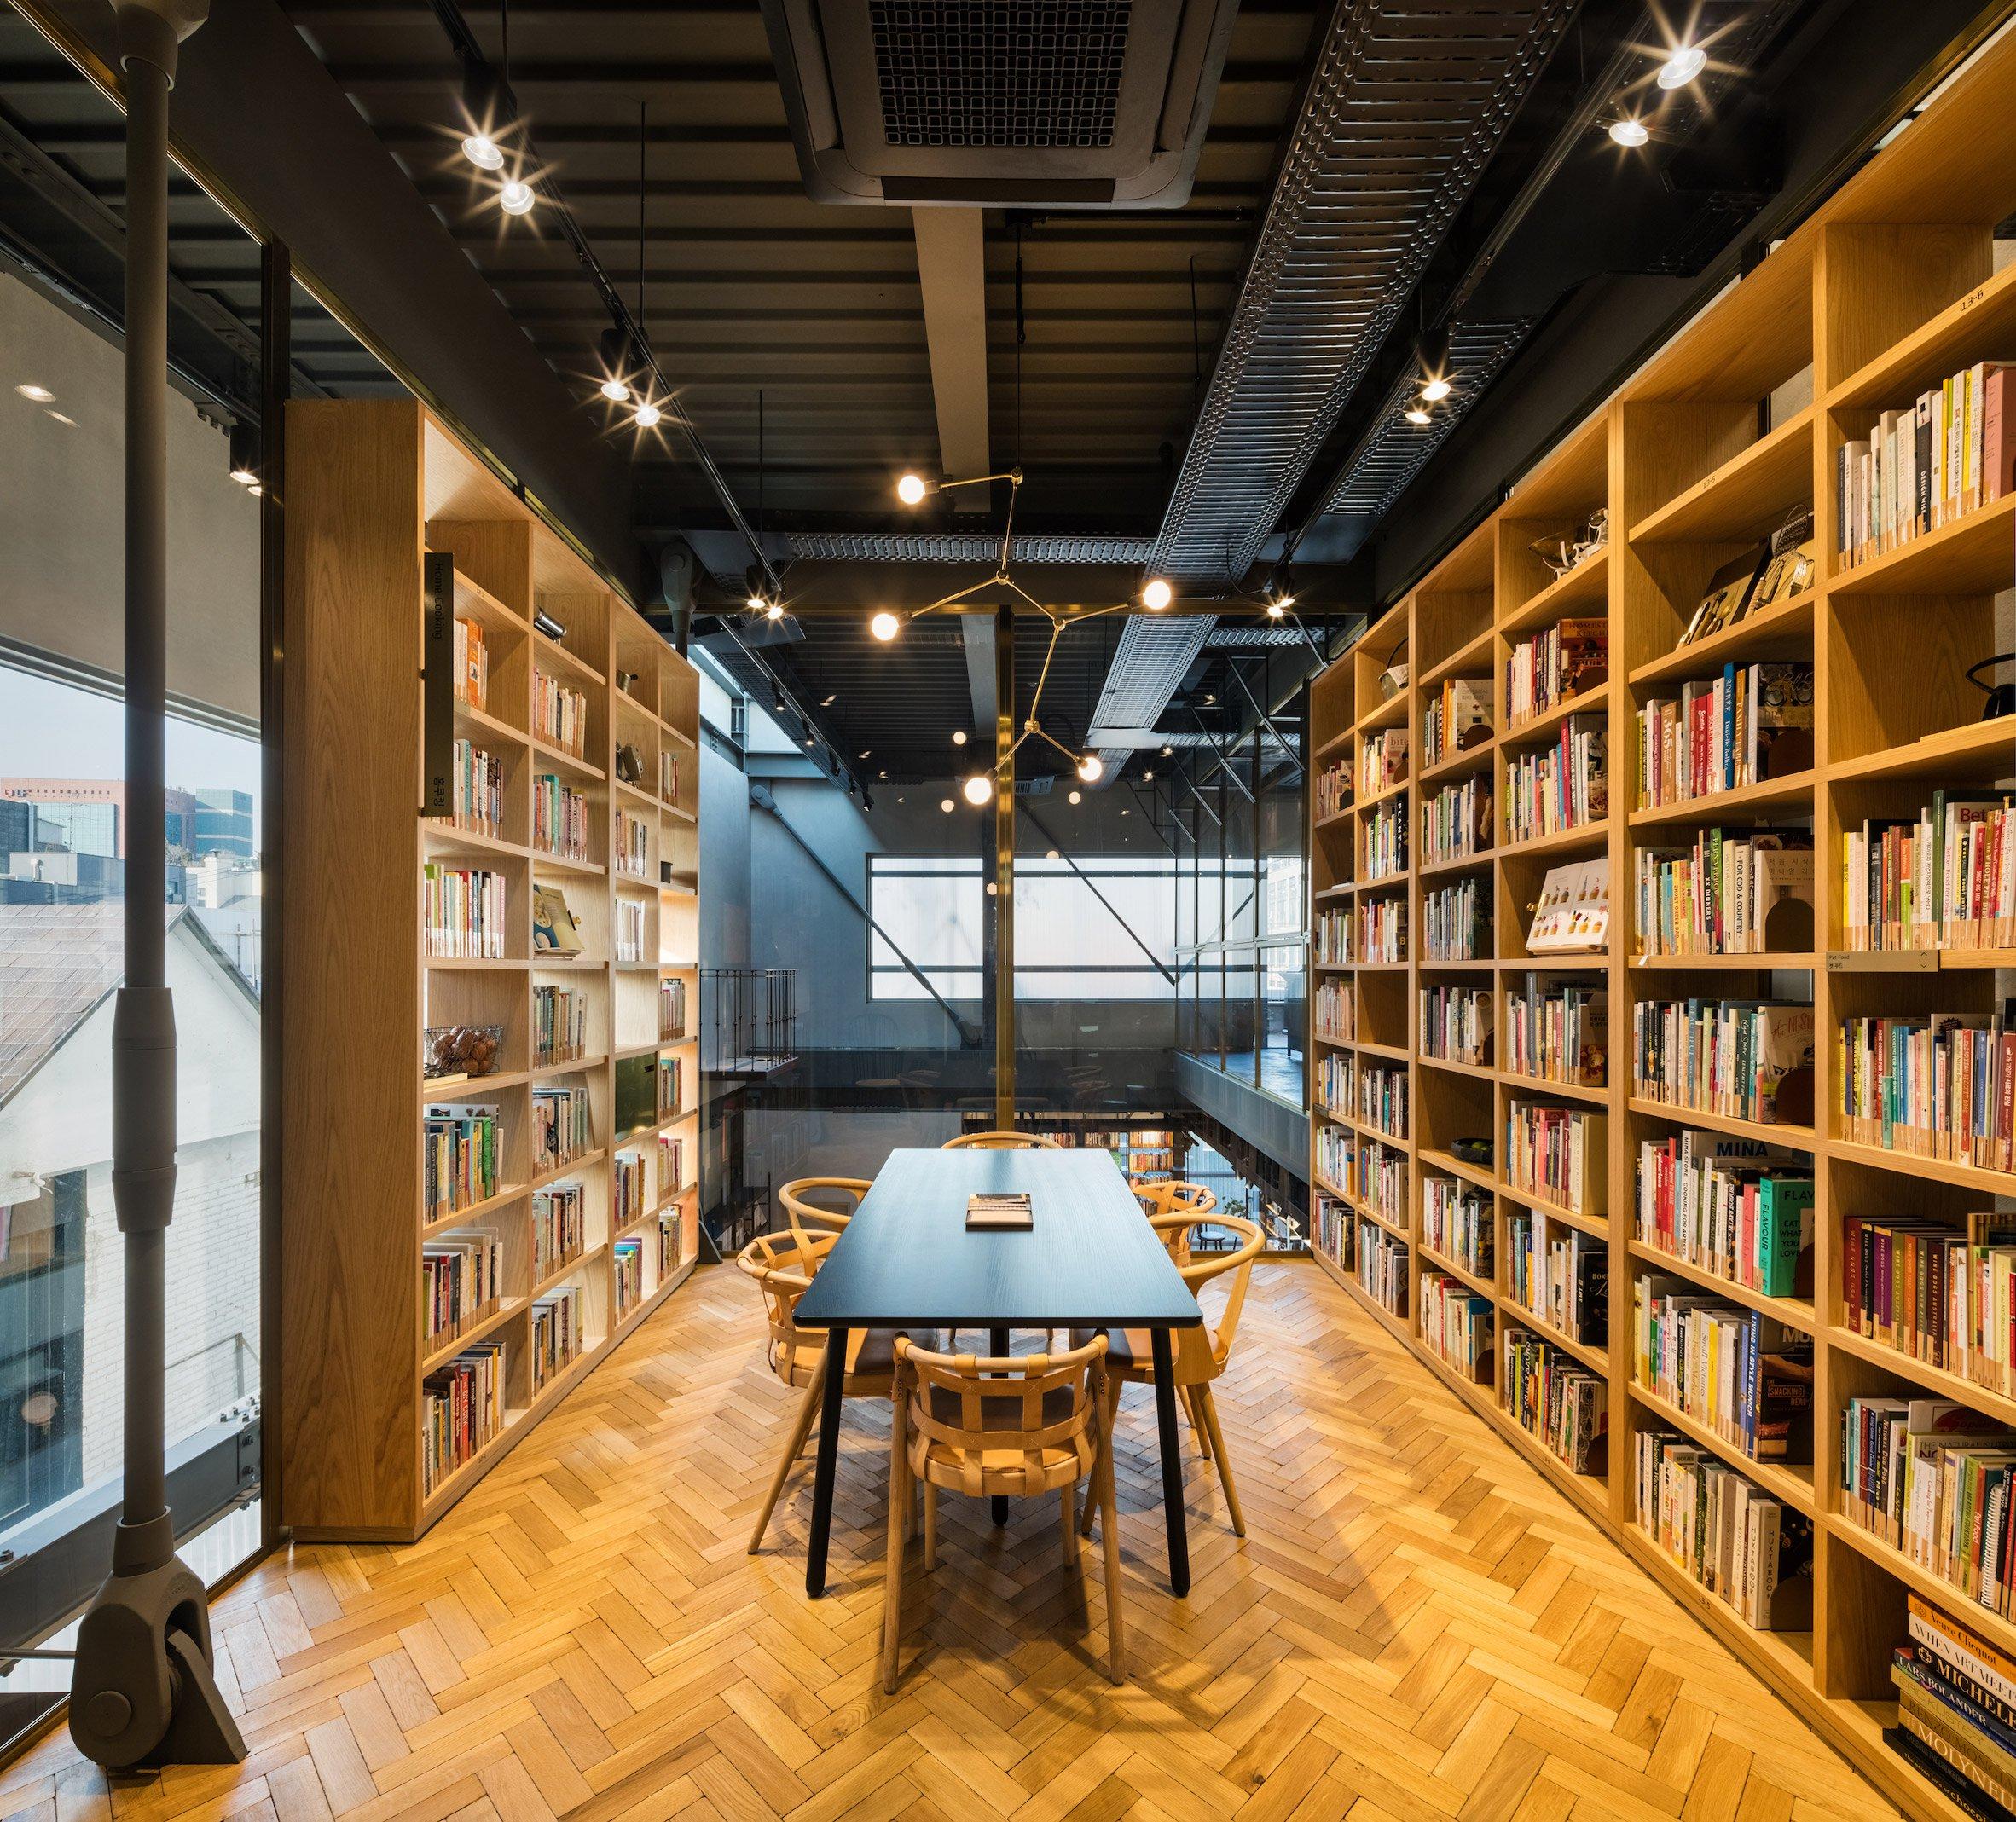 cooking-library-blacksheep-interiors_dezeen_2364_col_19.jpg